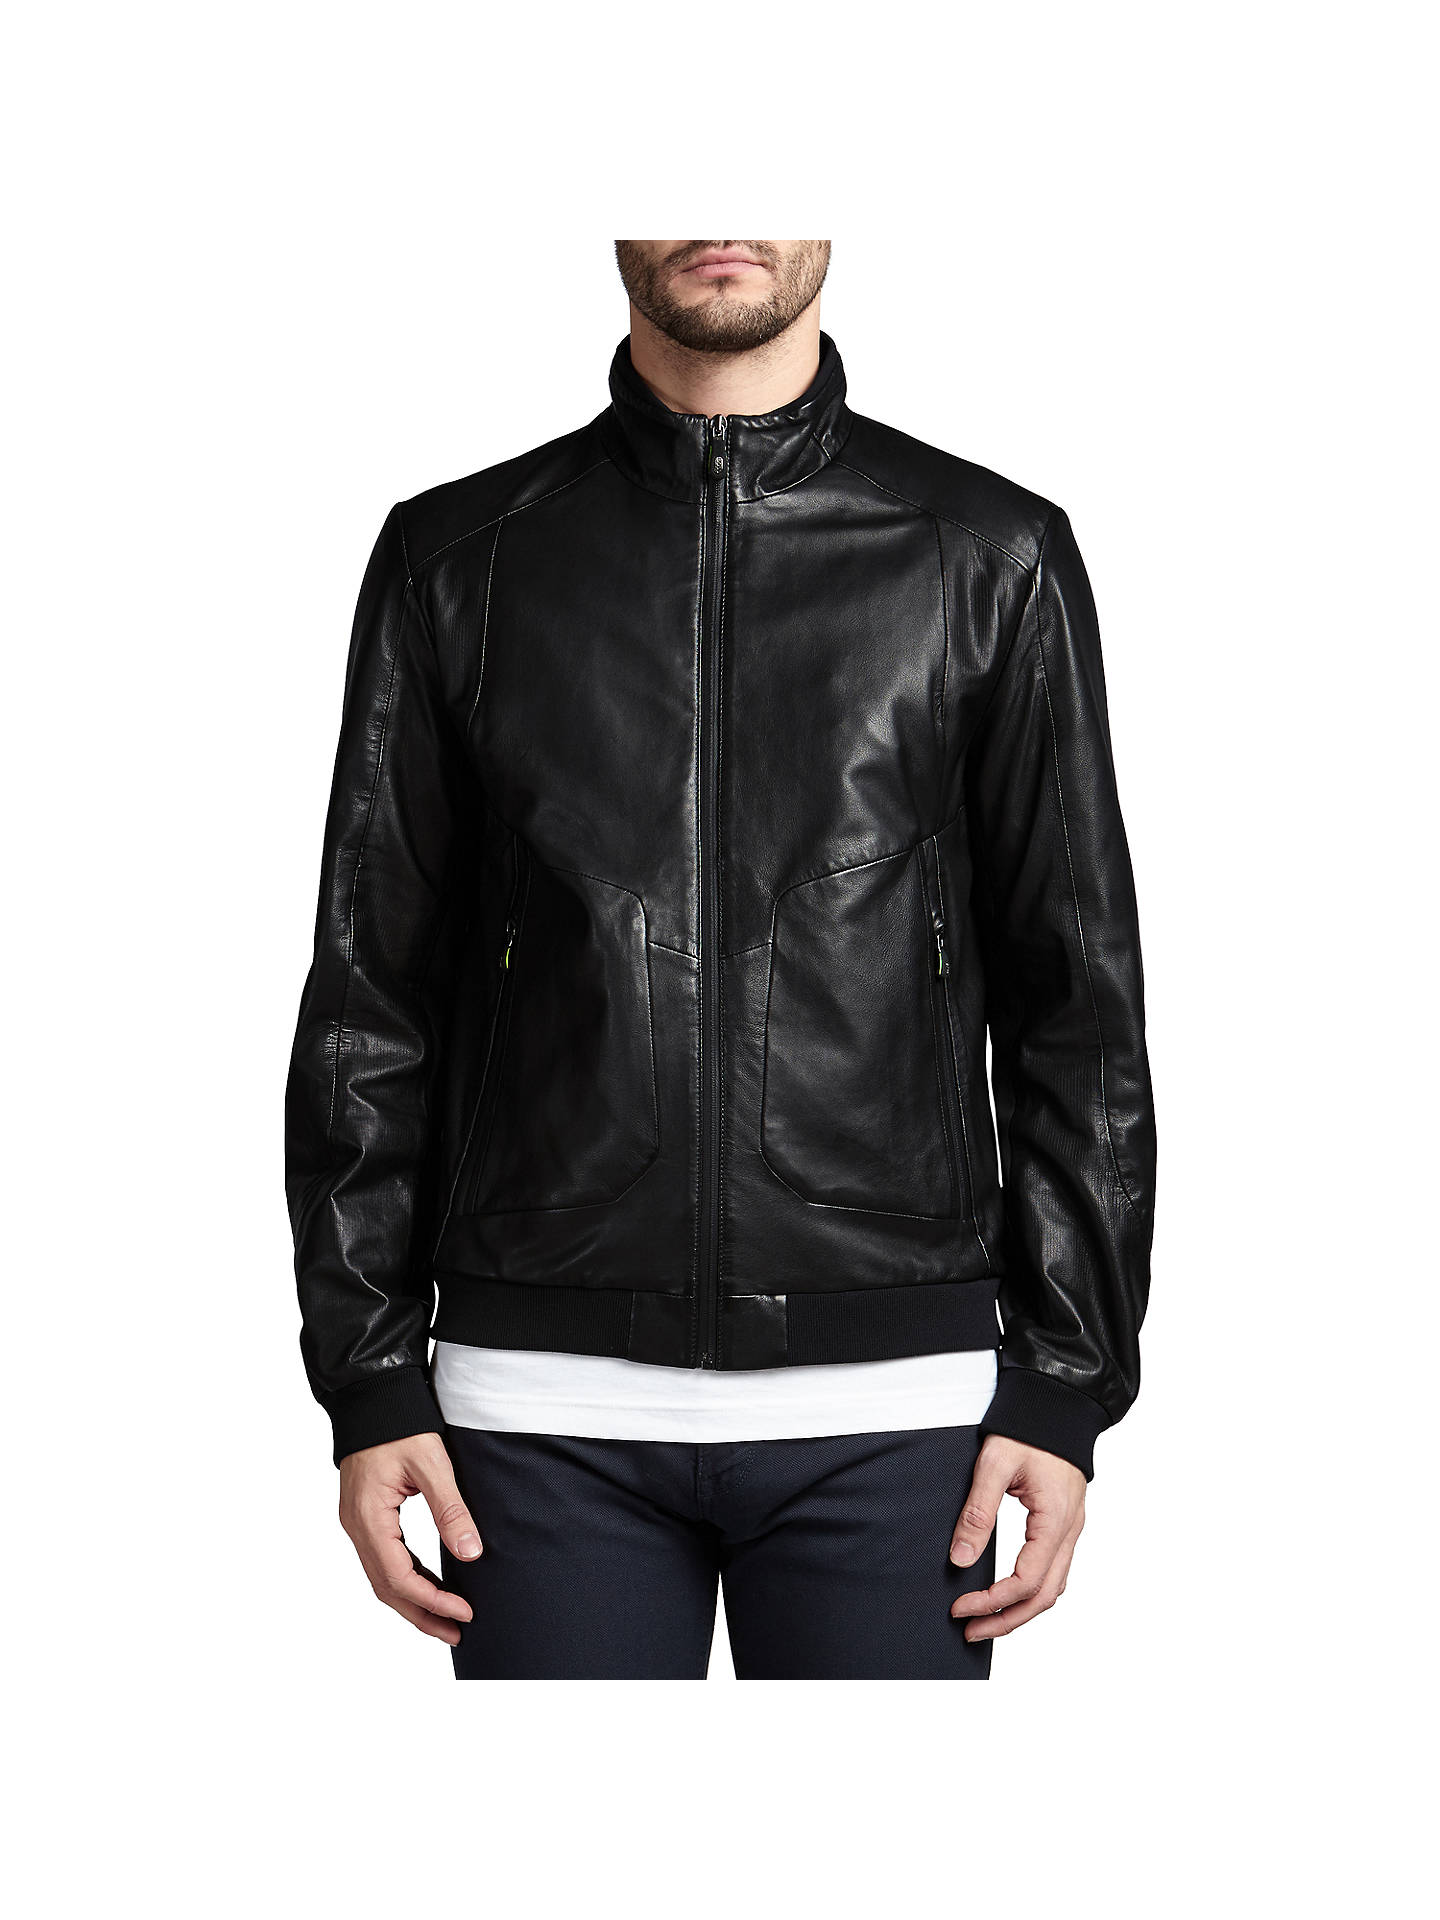 1fad9b19d BOSS Green Jesbo Leather Jacket, Black at John Lewis & Partners